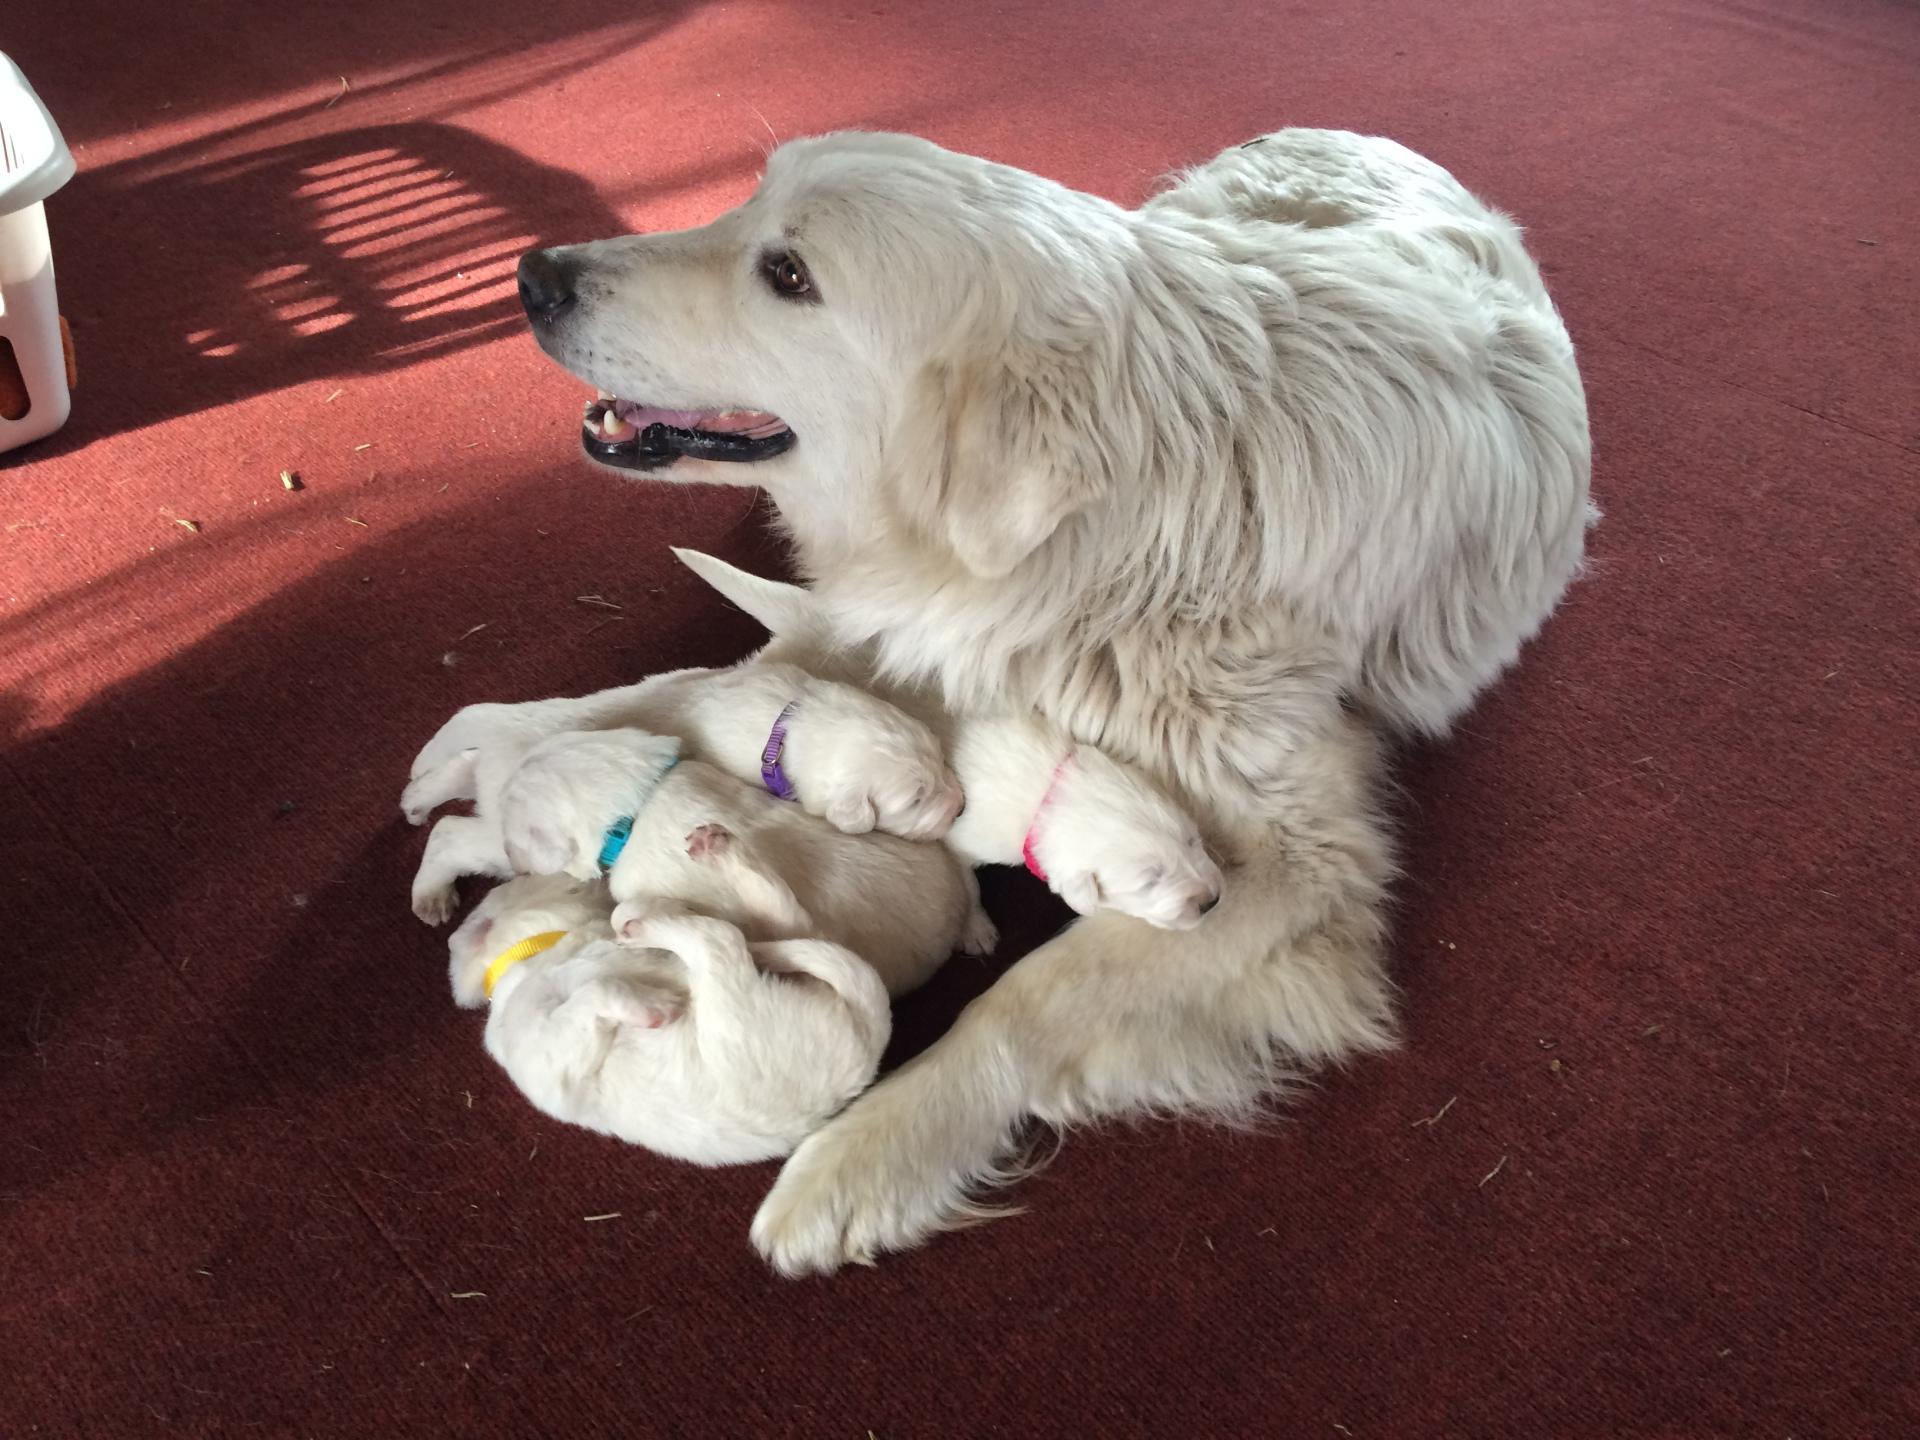 Lil & 2 week old pups